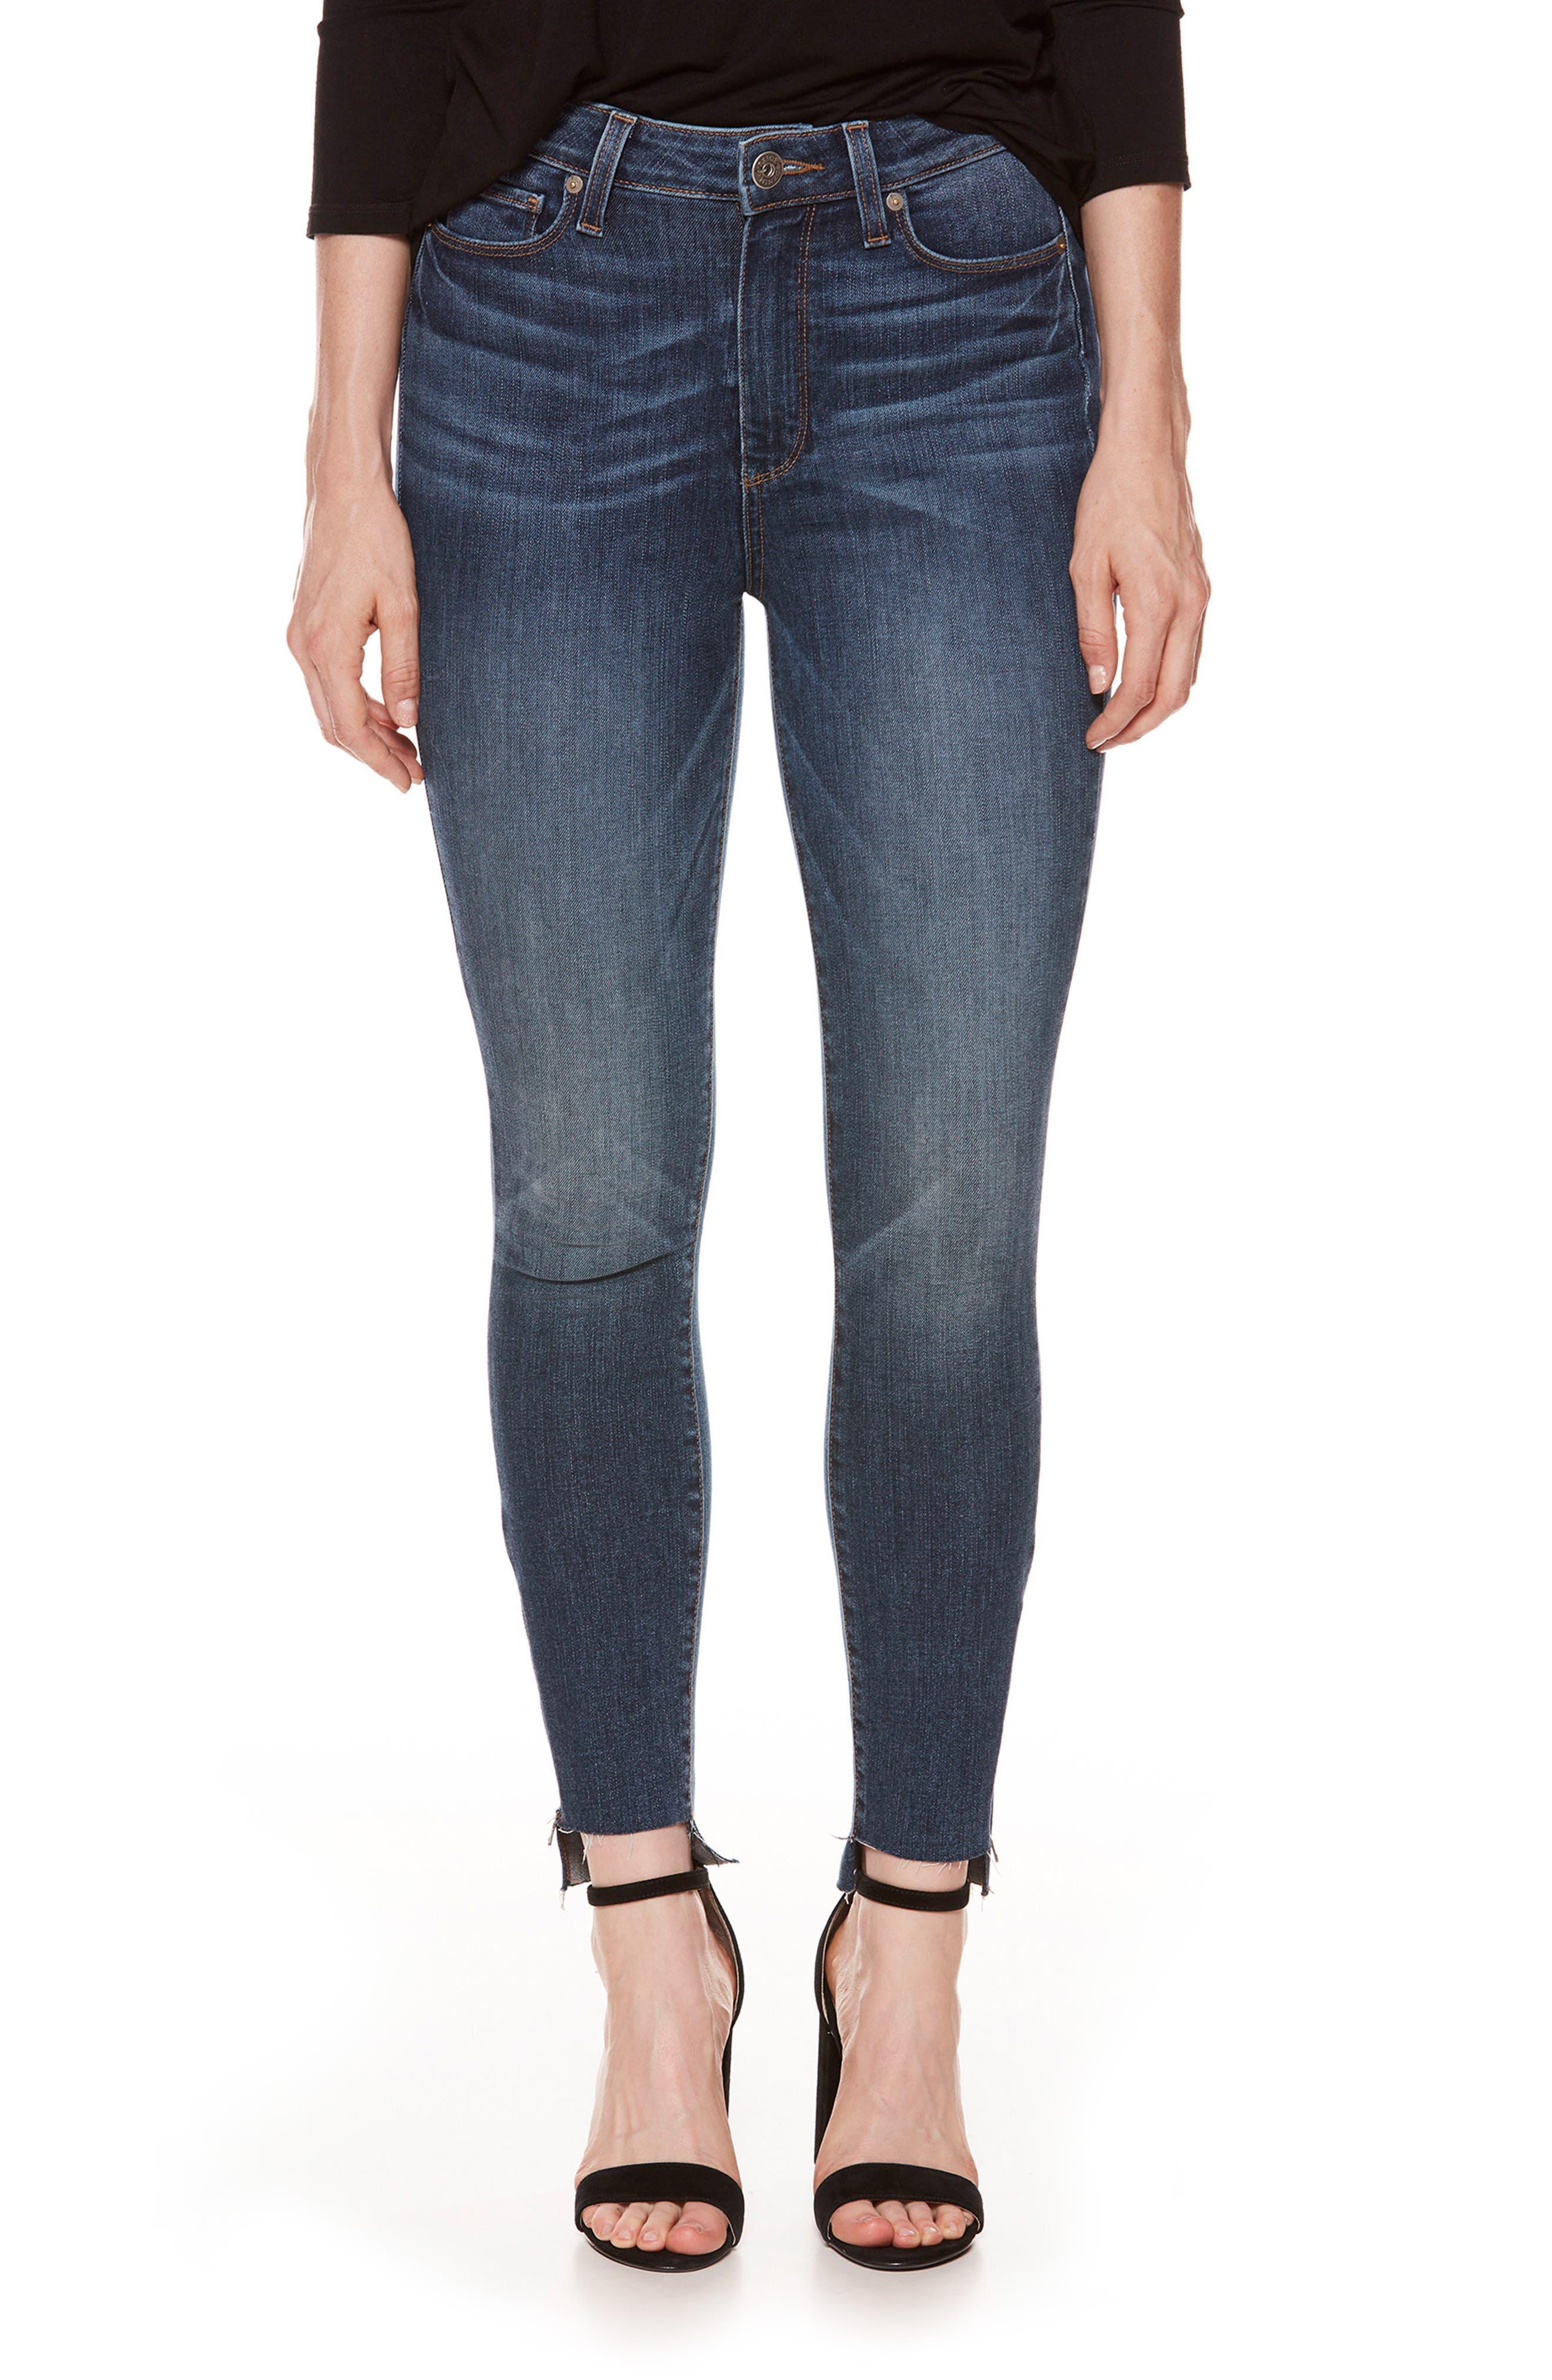 PAIGE Margot High Waist Zip Skinny Jeans (Westminster)